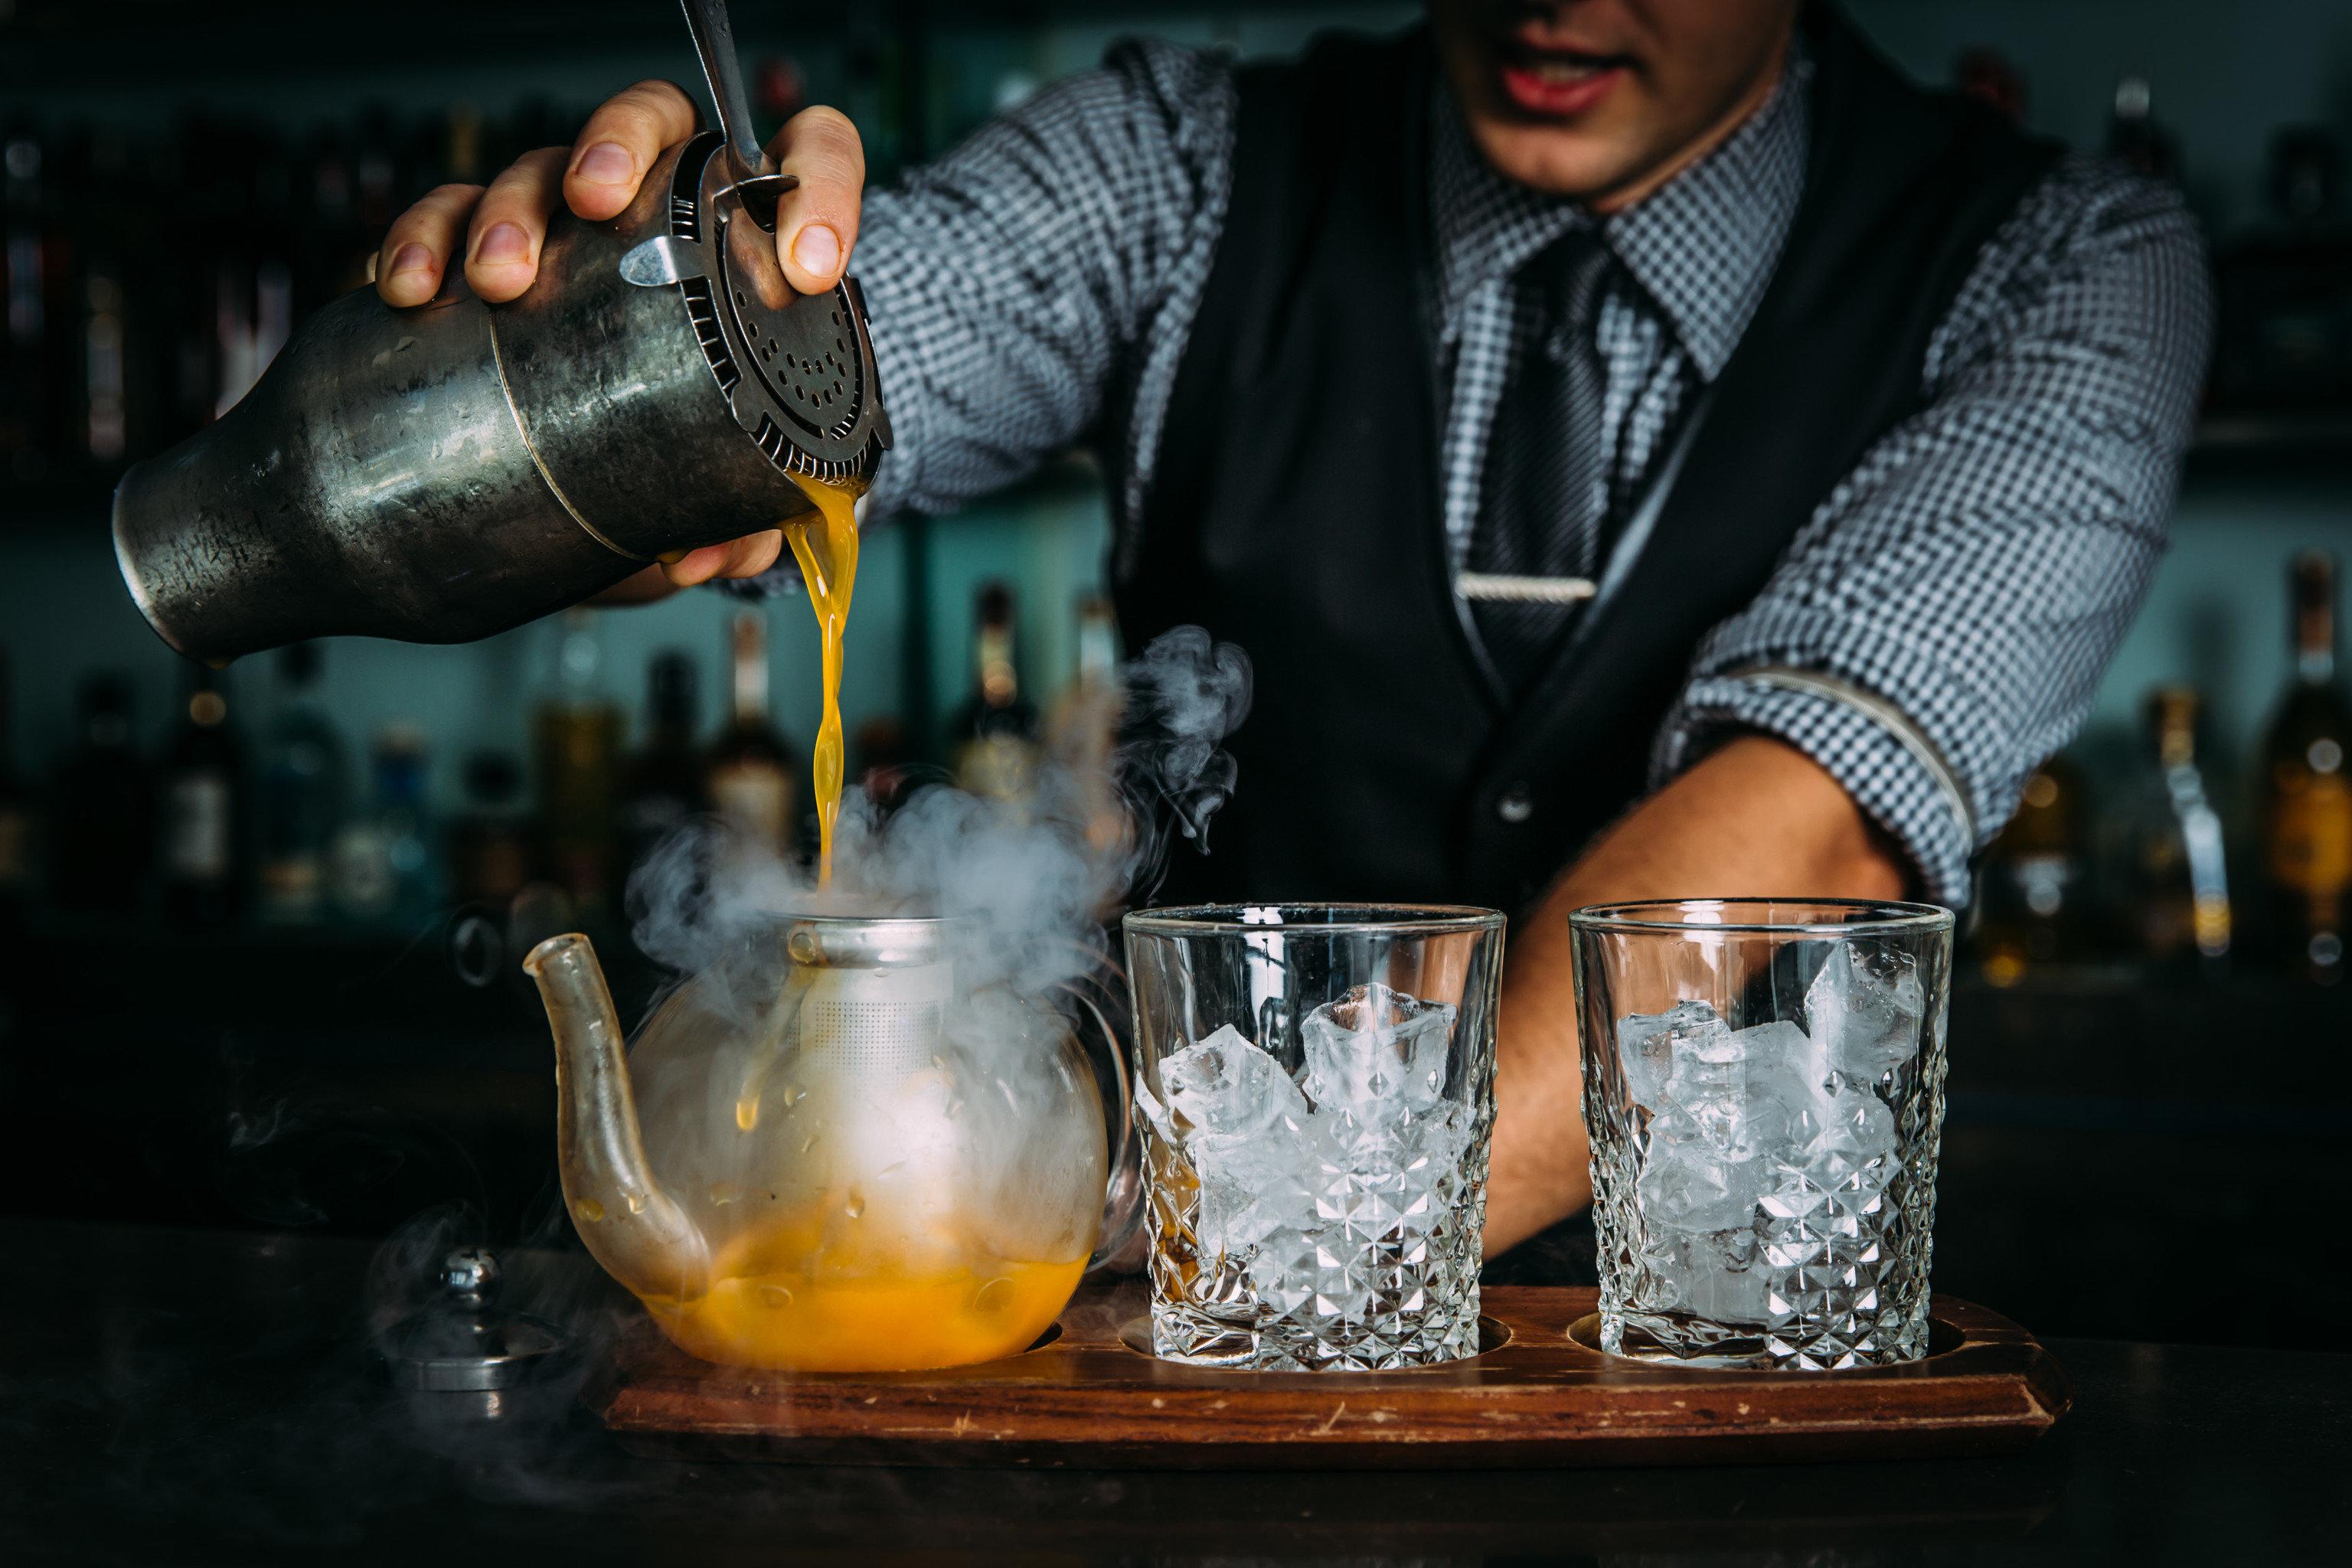 Trip Ideas person Drink alcohol distilled beverage sense beer appliance